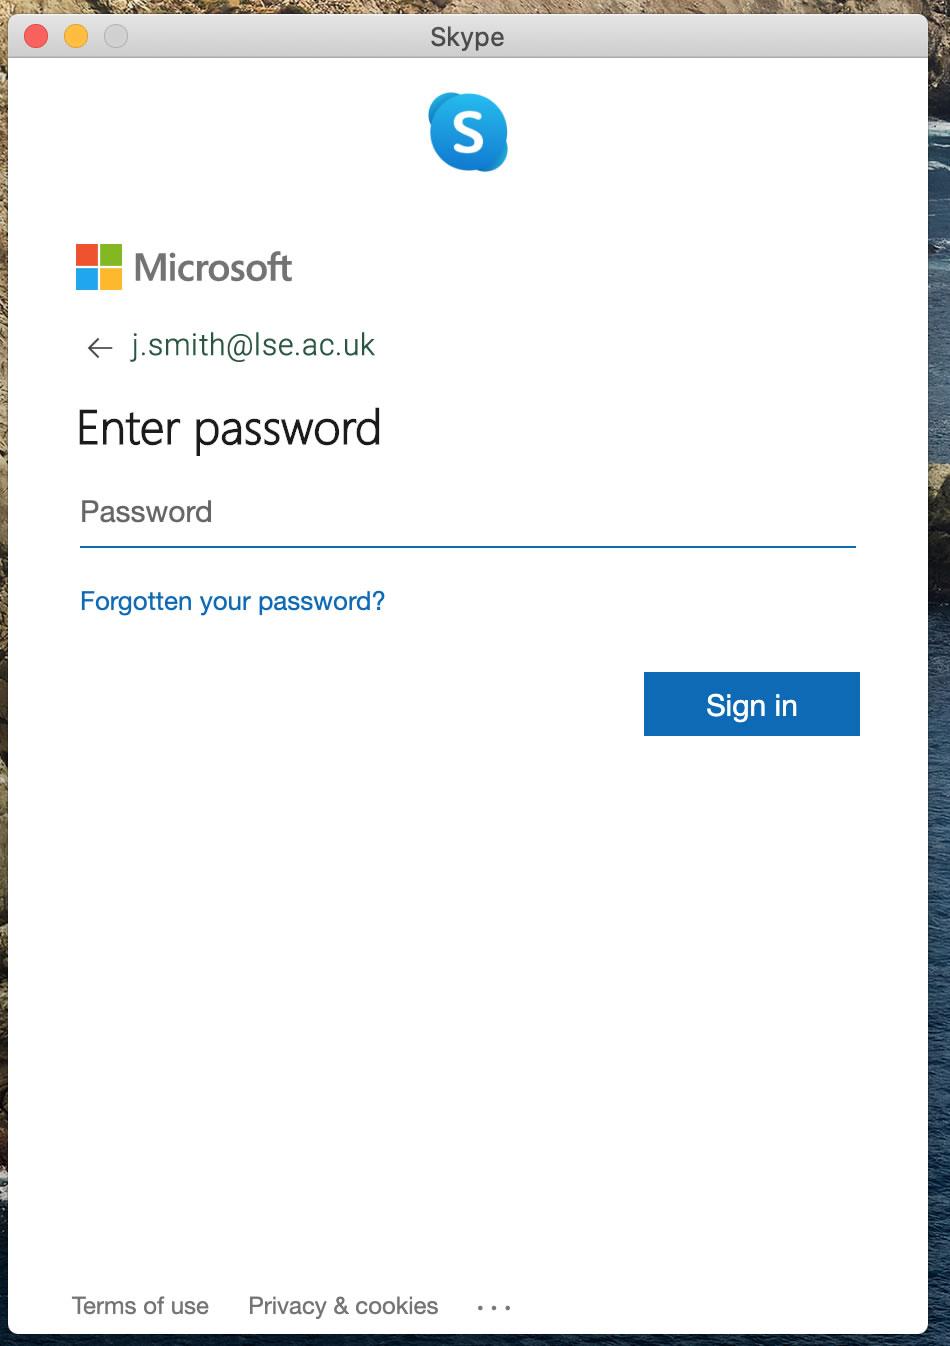 [Skype password]